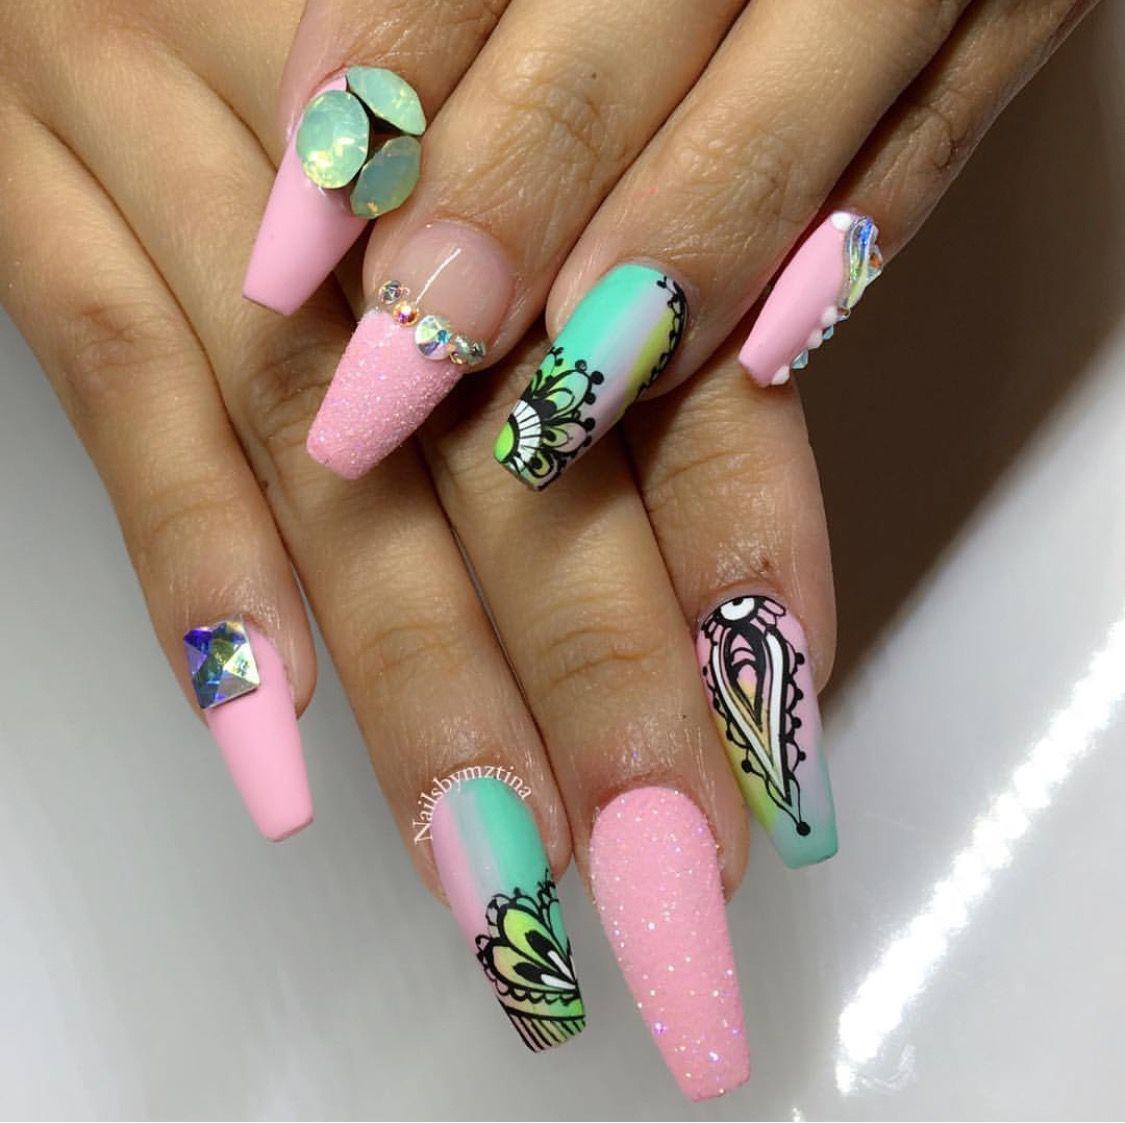 Pin by Alissa Spak on nail salon   Pinterest   Nail salons and Salons